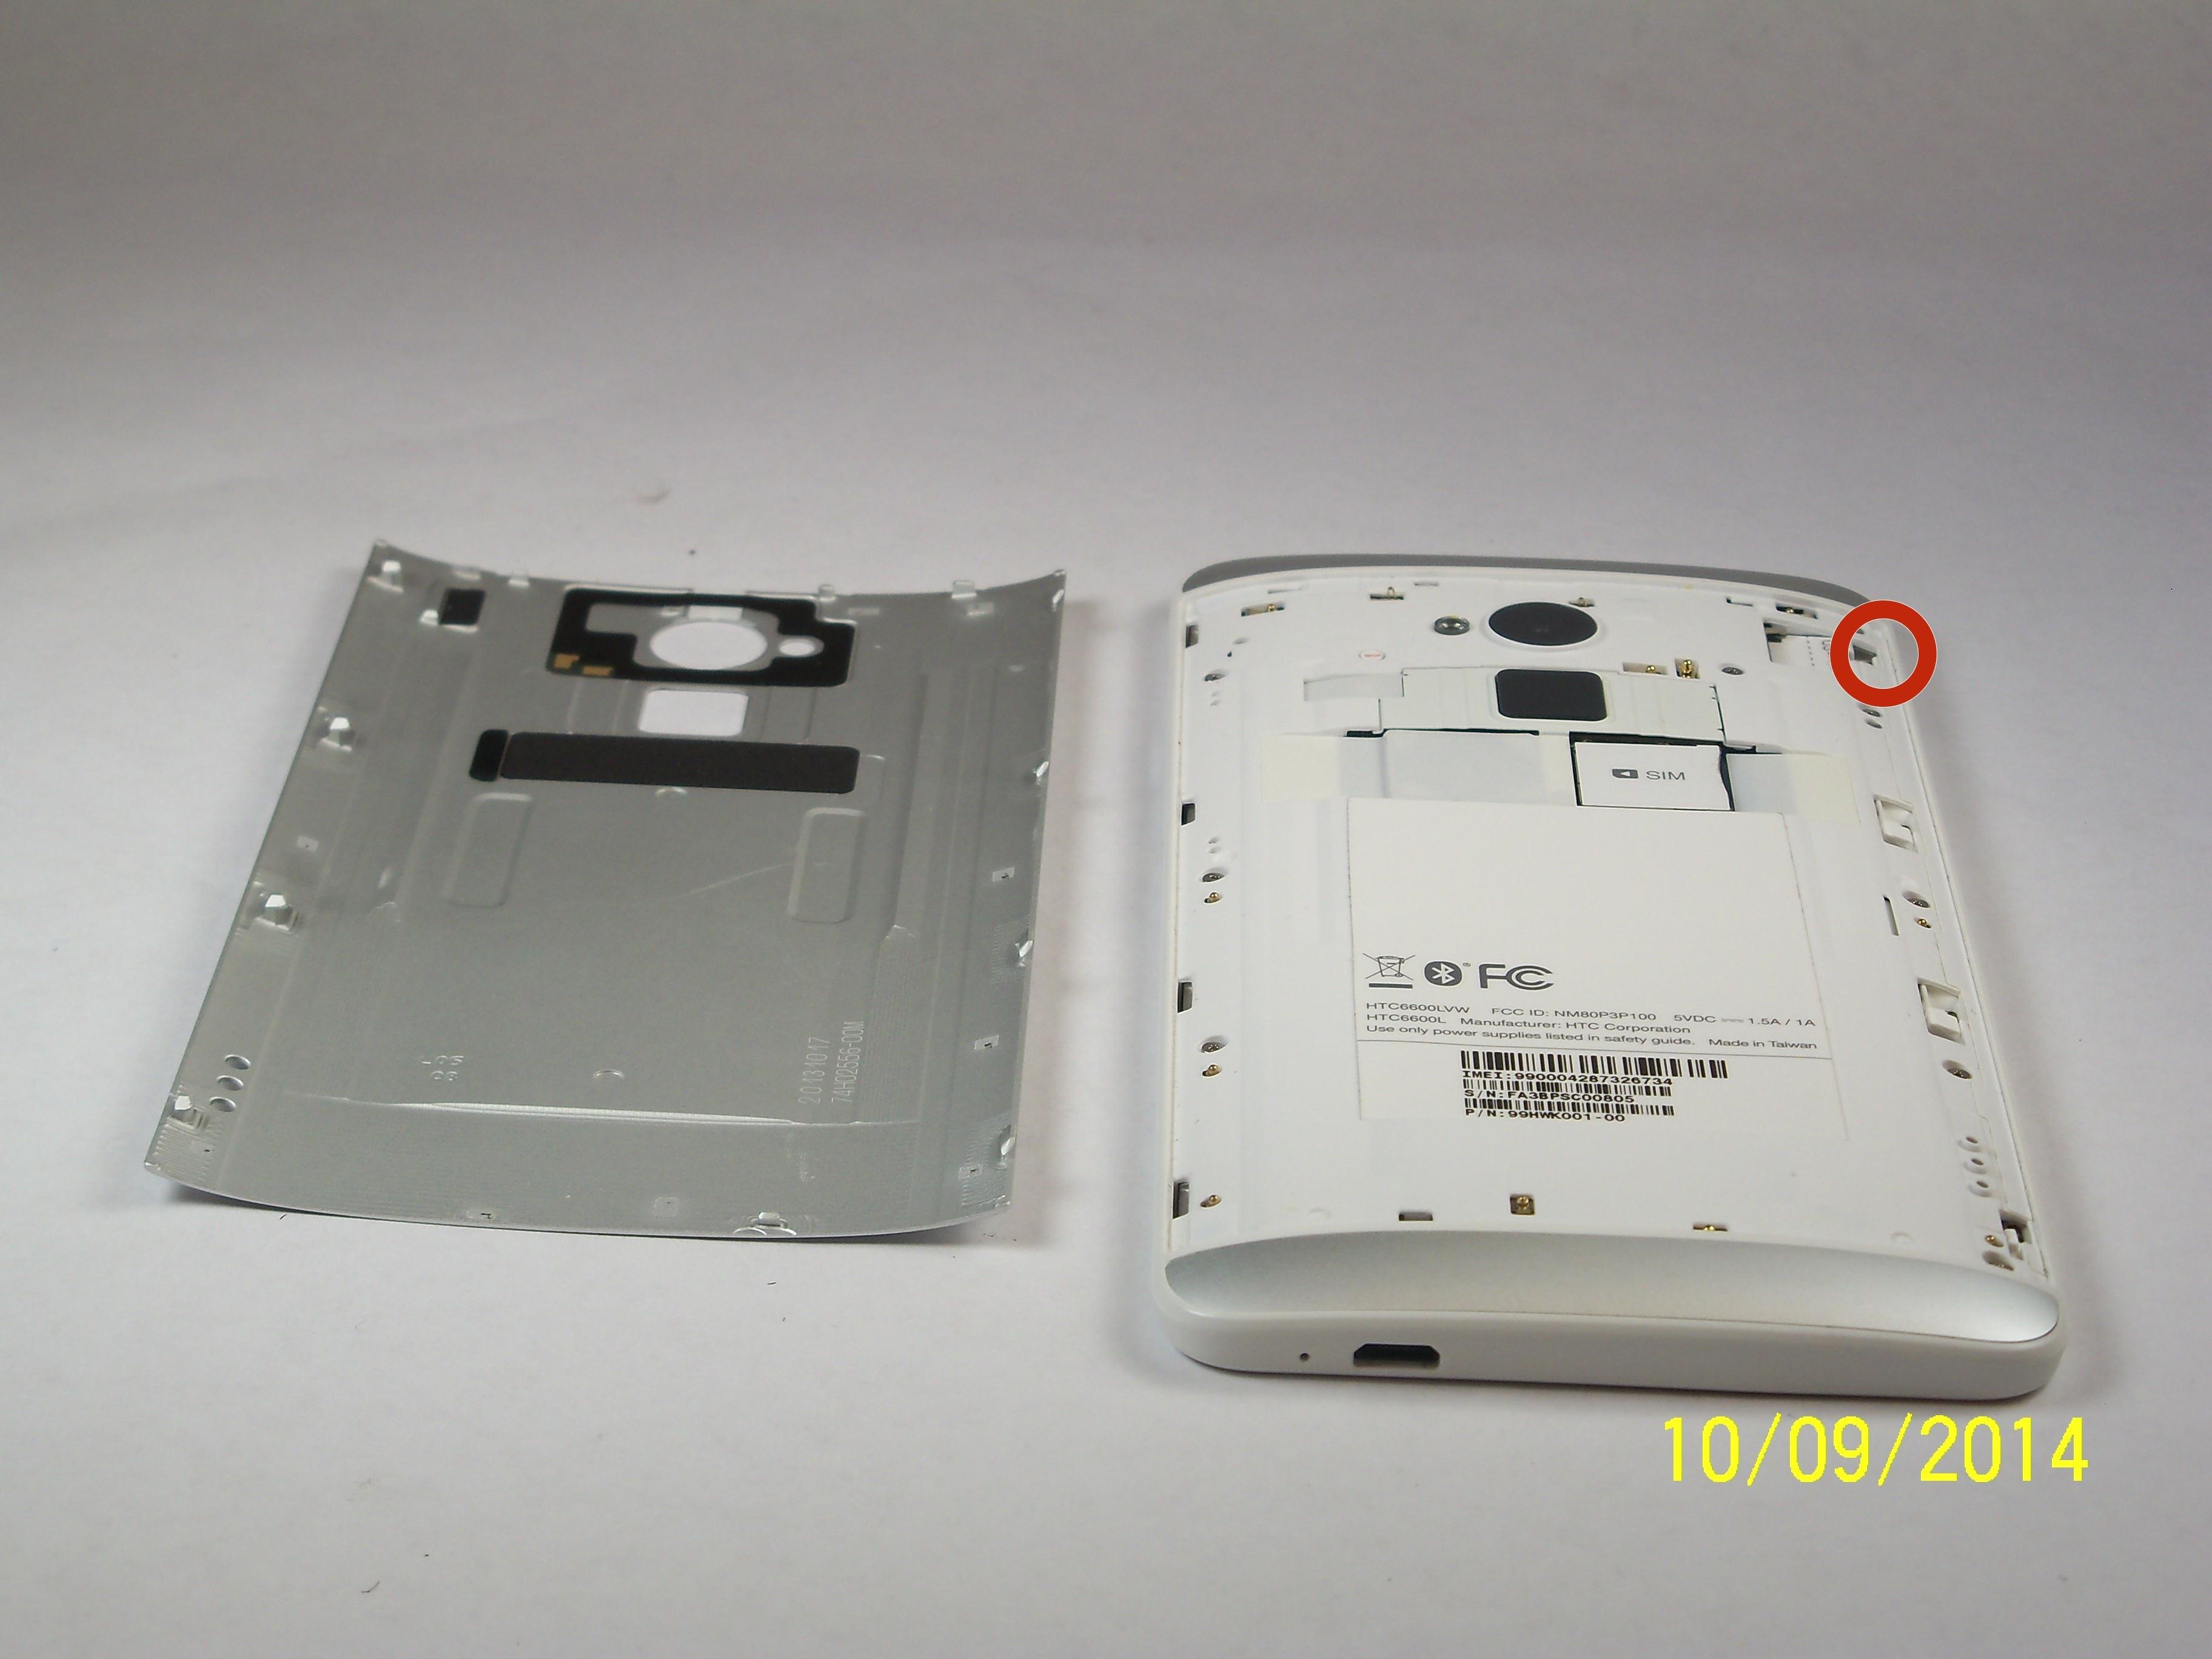 HTC One Max Repair - iFixit